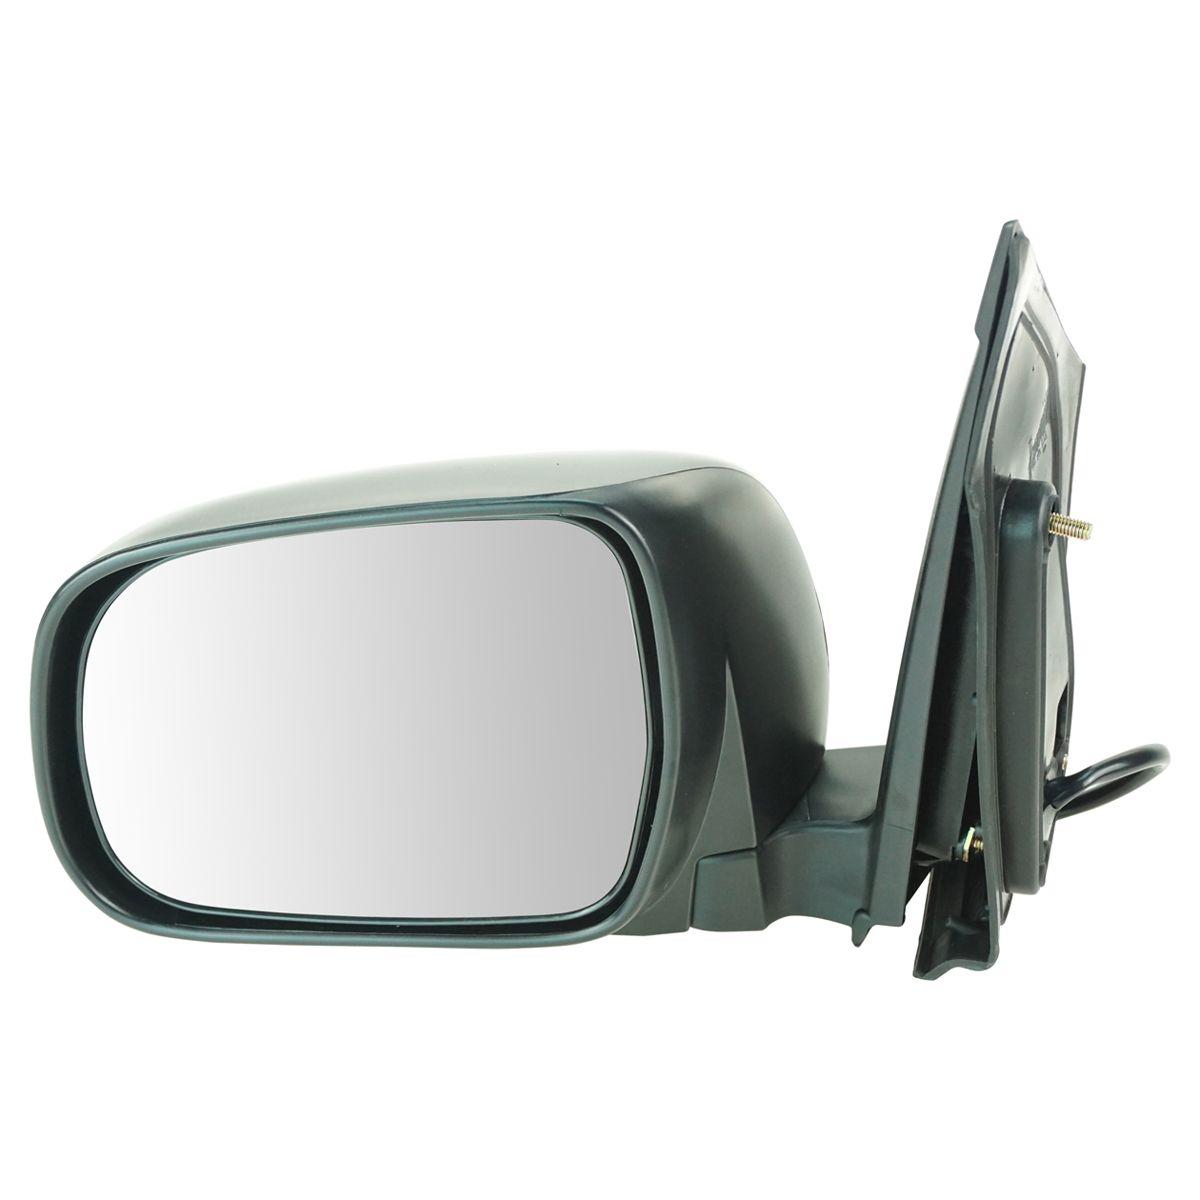 Fits Toyota Sienna 04-10 Van Passengers Side View Power Mirror Glass w// Housing